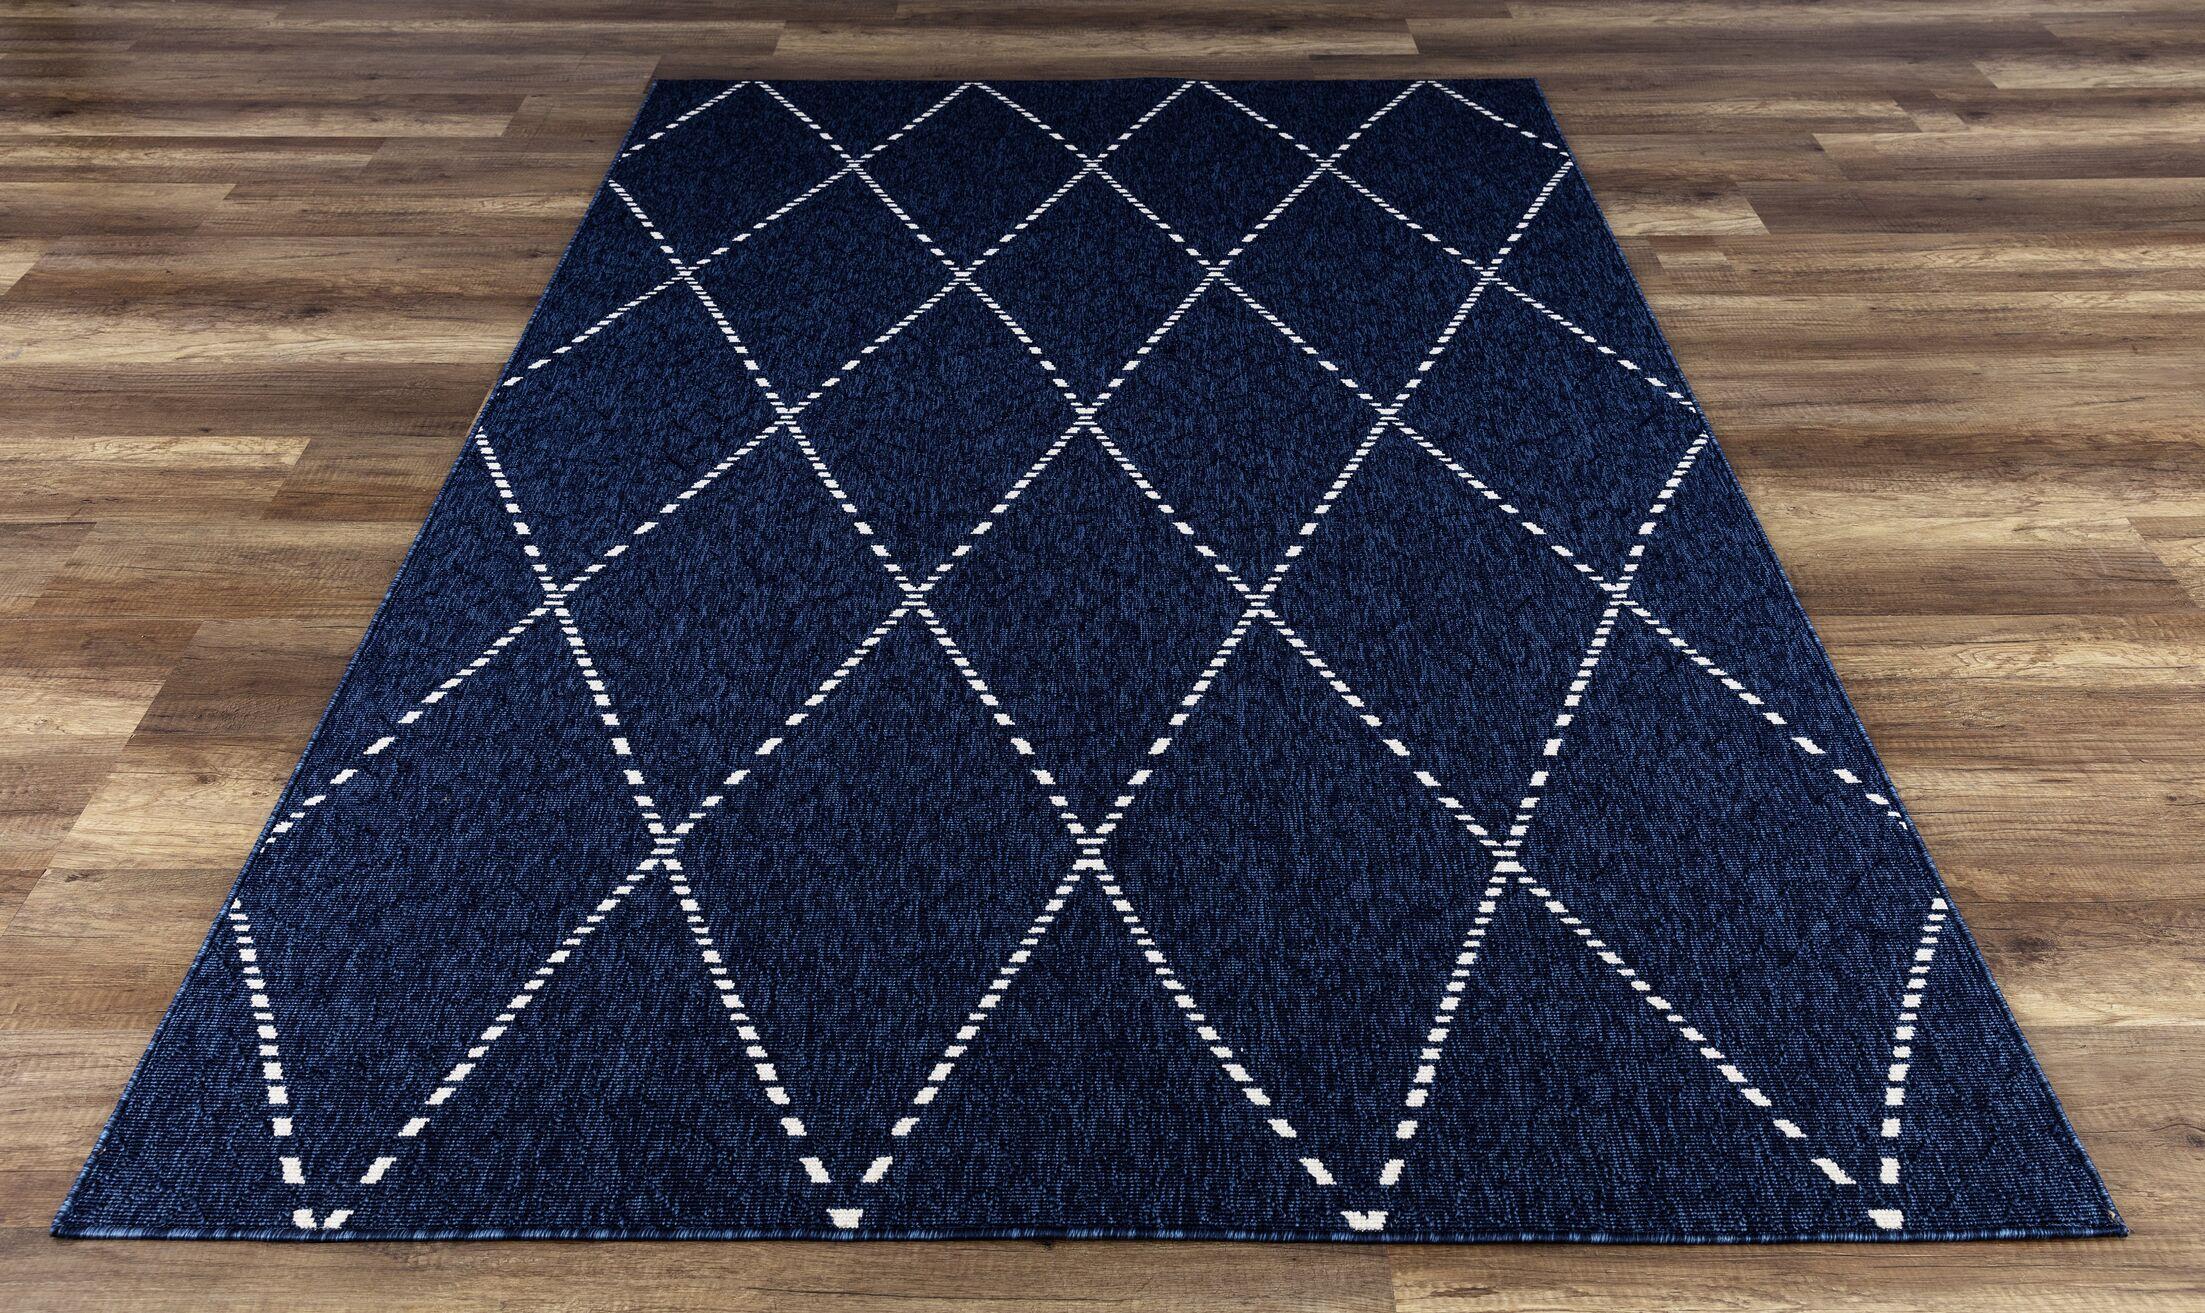 Godinez High-Quality Navy Indoor/Outdoor Area Rug Rug Size: Rectangle 5'3